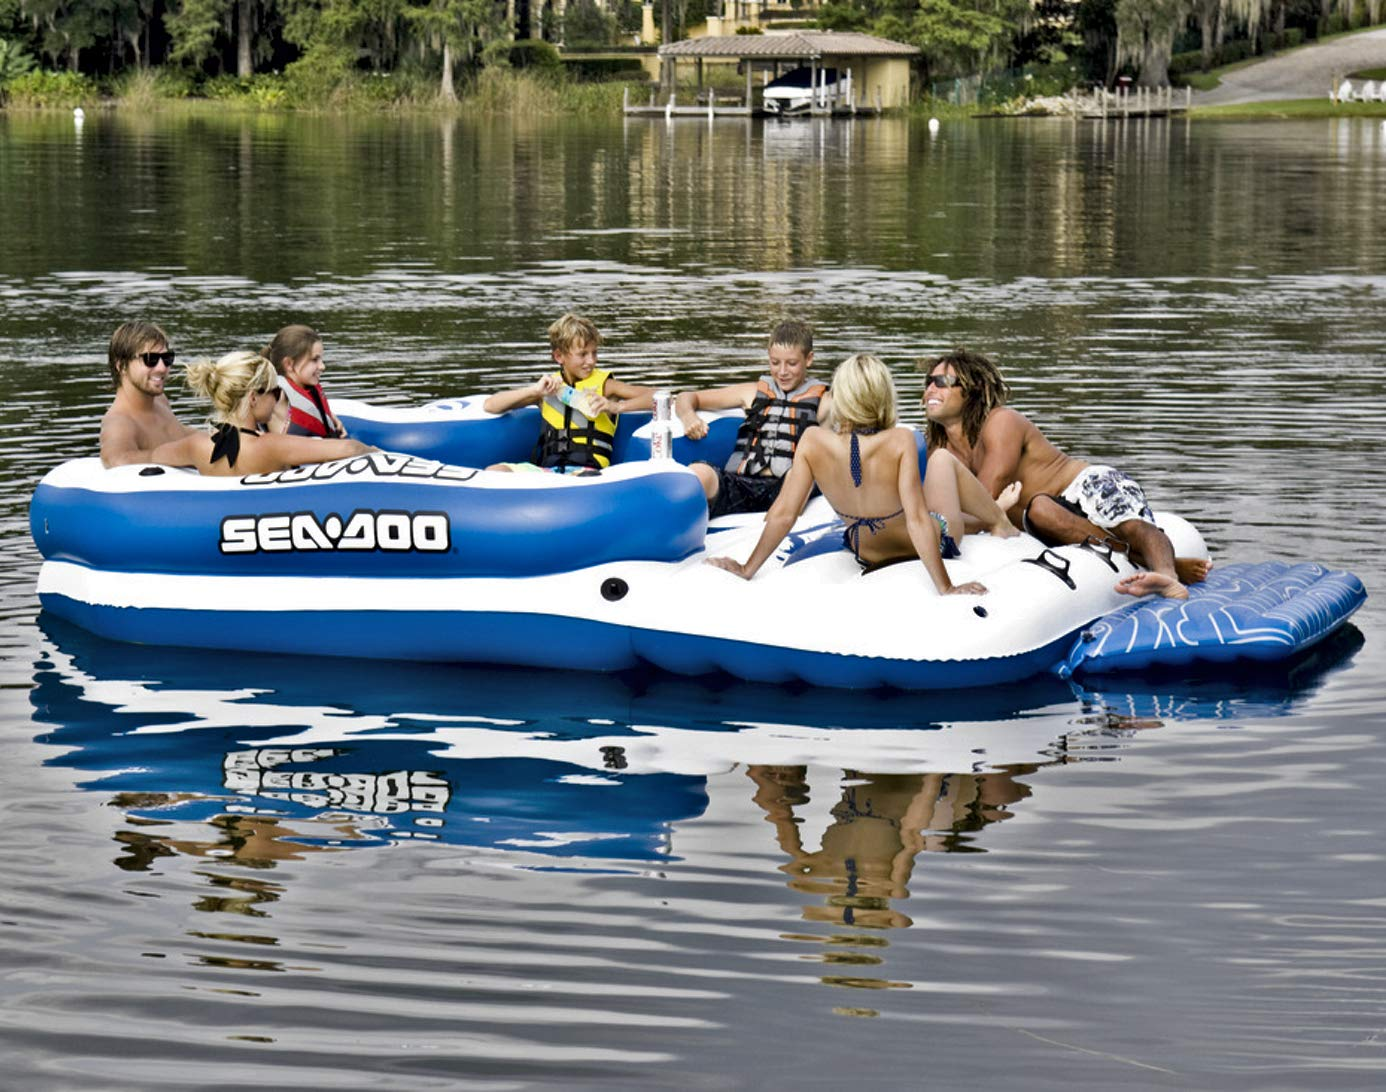 Sea-Doo B003E1XVOY 8人用 8人用 空気注入式 空気注入式 メガアイランドレイクフロート スピーカーミュージックシステム4個付き B003E1XVOY, 期間限定特別価格:e22684dd --- itxassou.fr